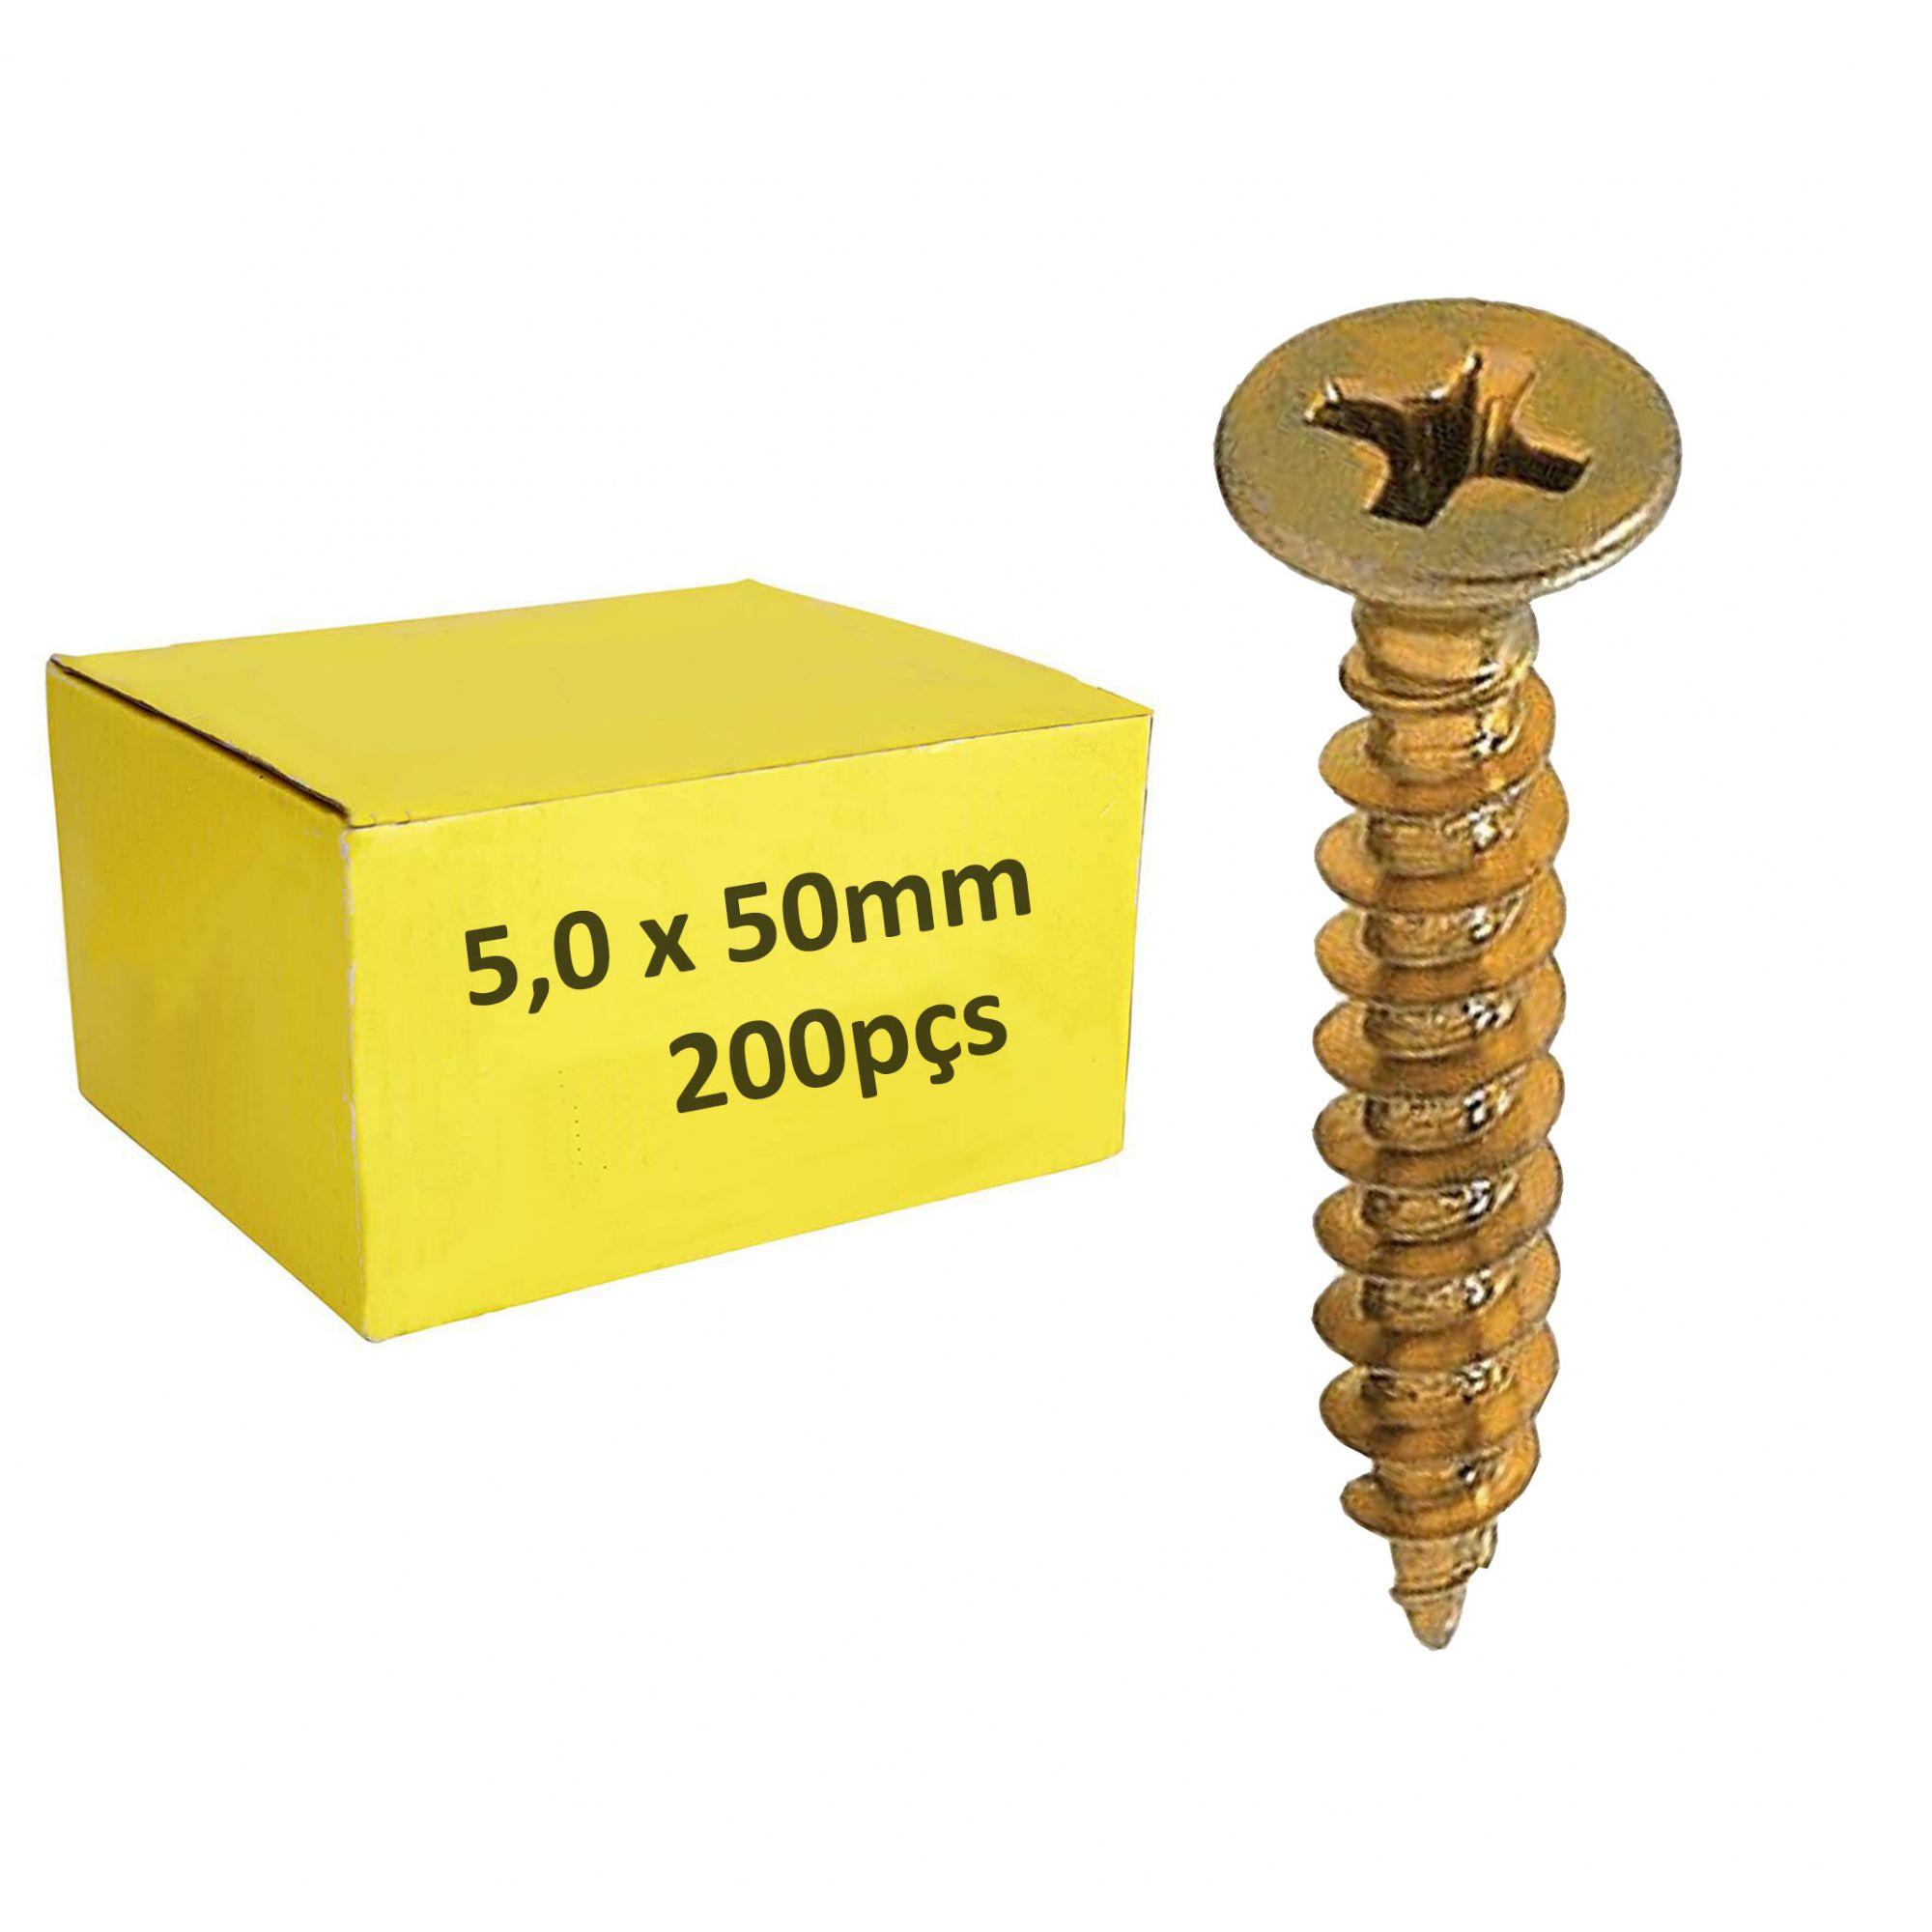 Parafuso 5,0mm x 50mm ChipBoard bicromatizado Cx c/ 200pçs